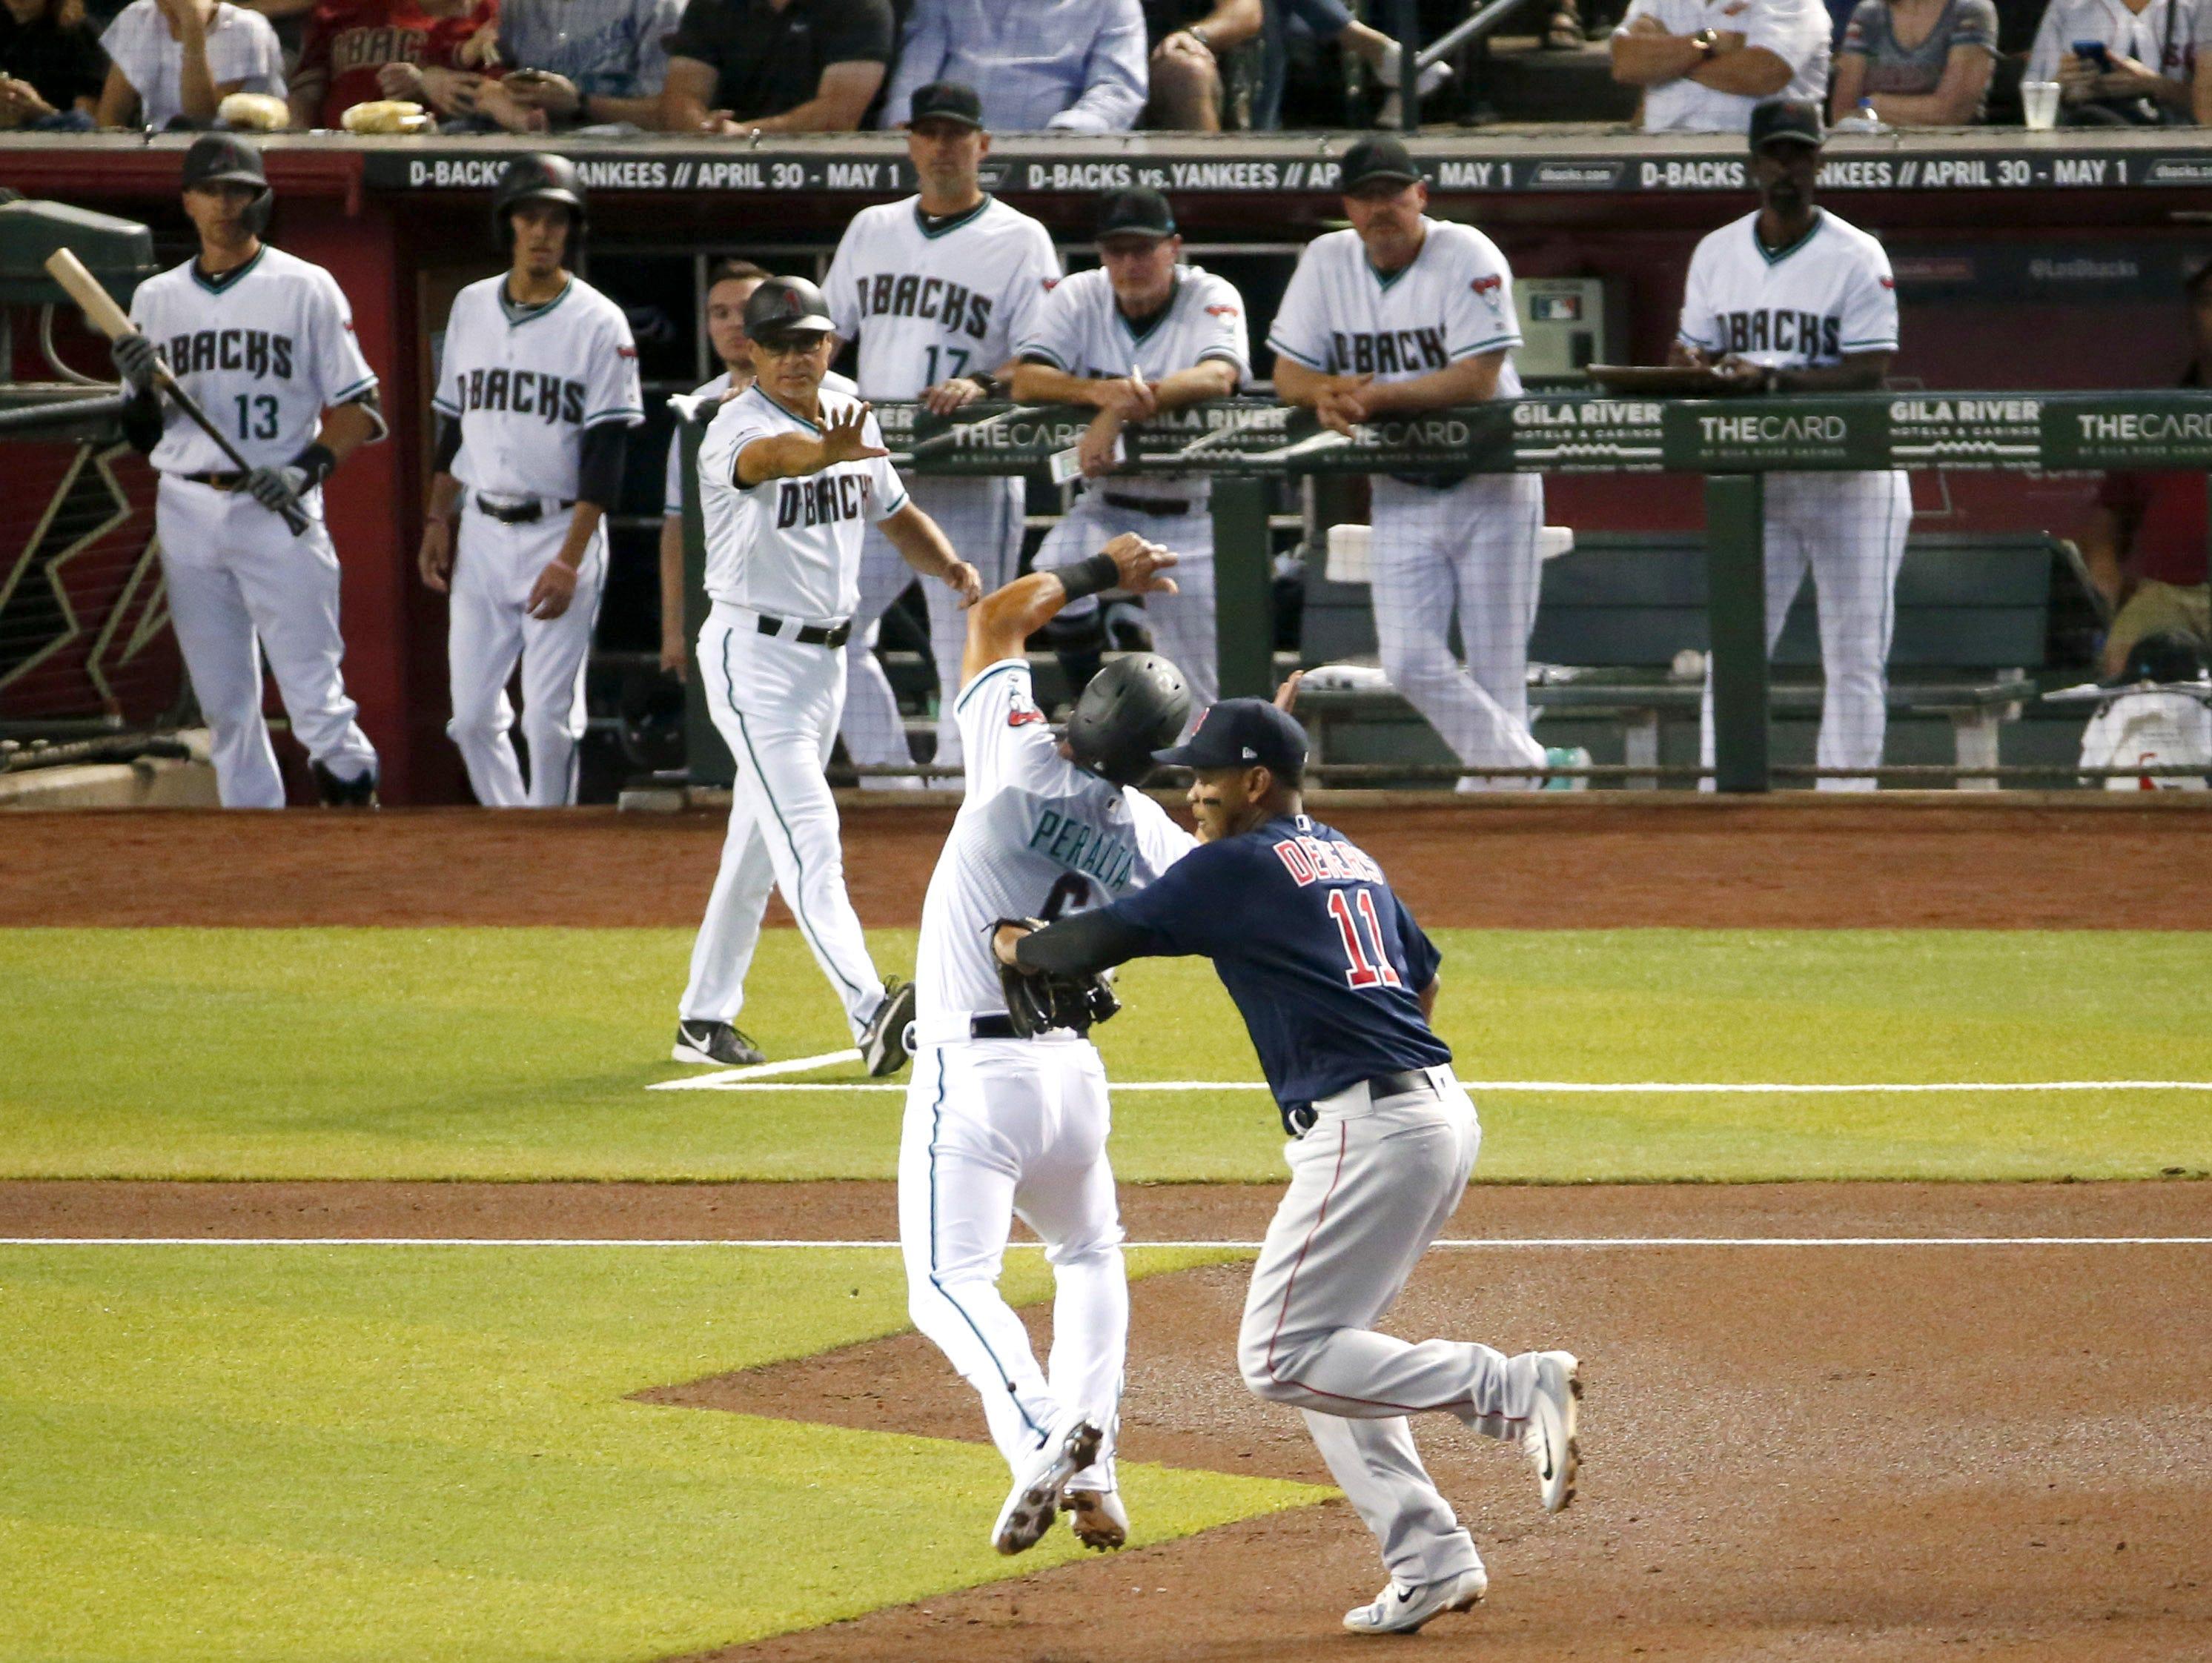 Boston Red Sox third baseman Rafael Devers (11) outs Arizona Diamondbacks right fielder David Peralta (6) during Opening Day at Chase Field in Phoenix on April 5.